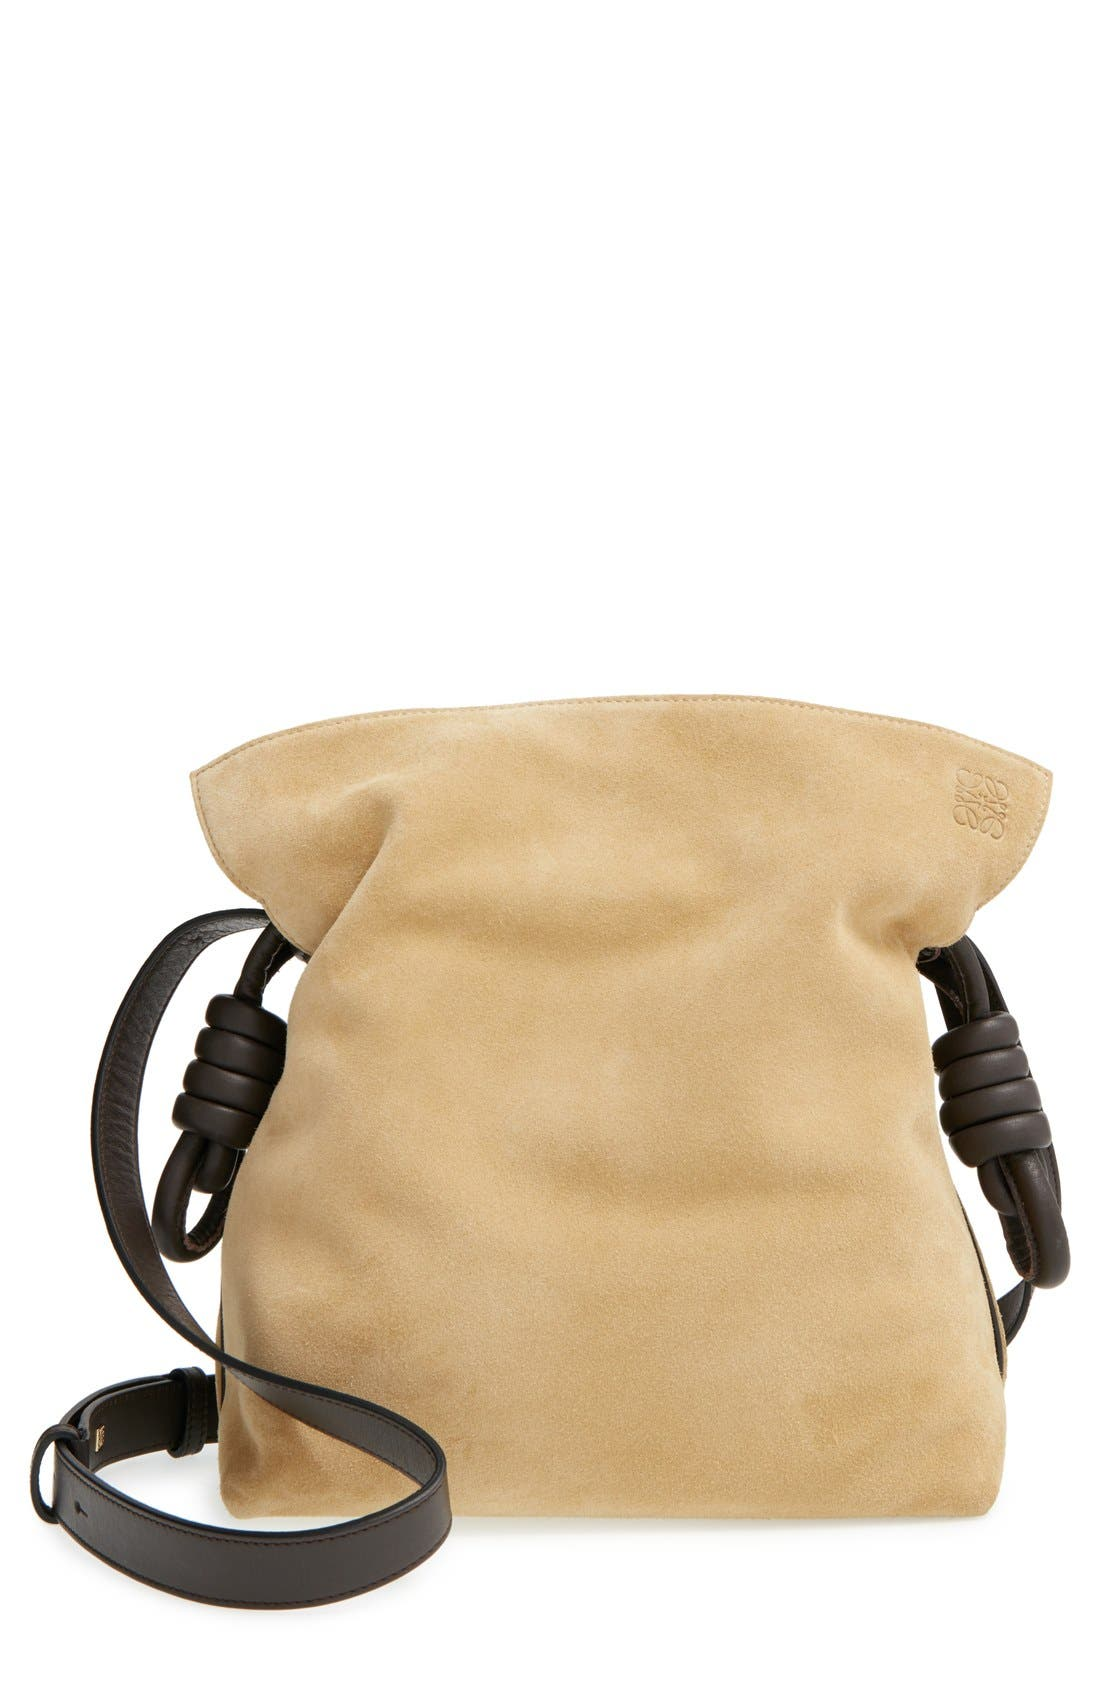 LOEWE, 'Flamenco Knot' Suede & Calfskin Leather Bag, Main thumbnail 1, color, 250